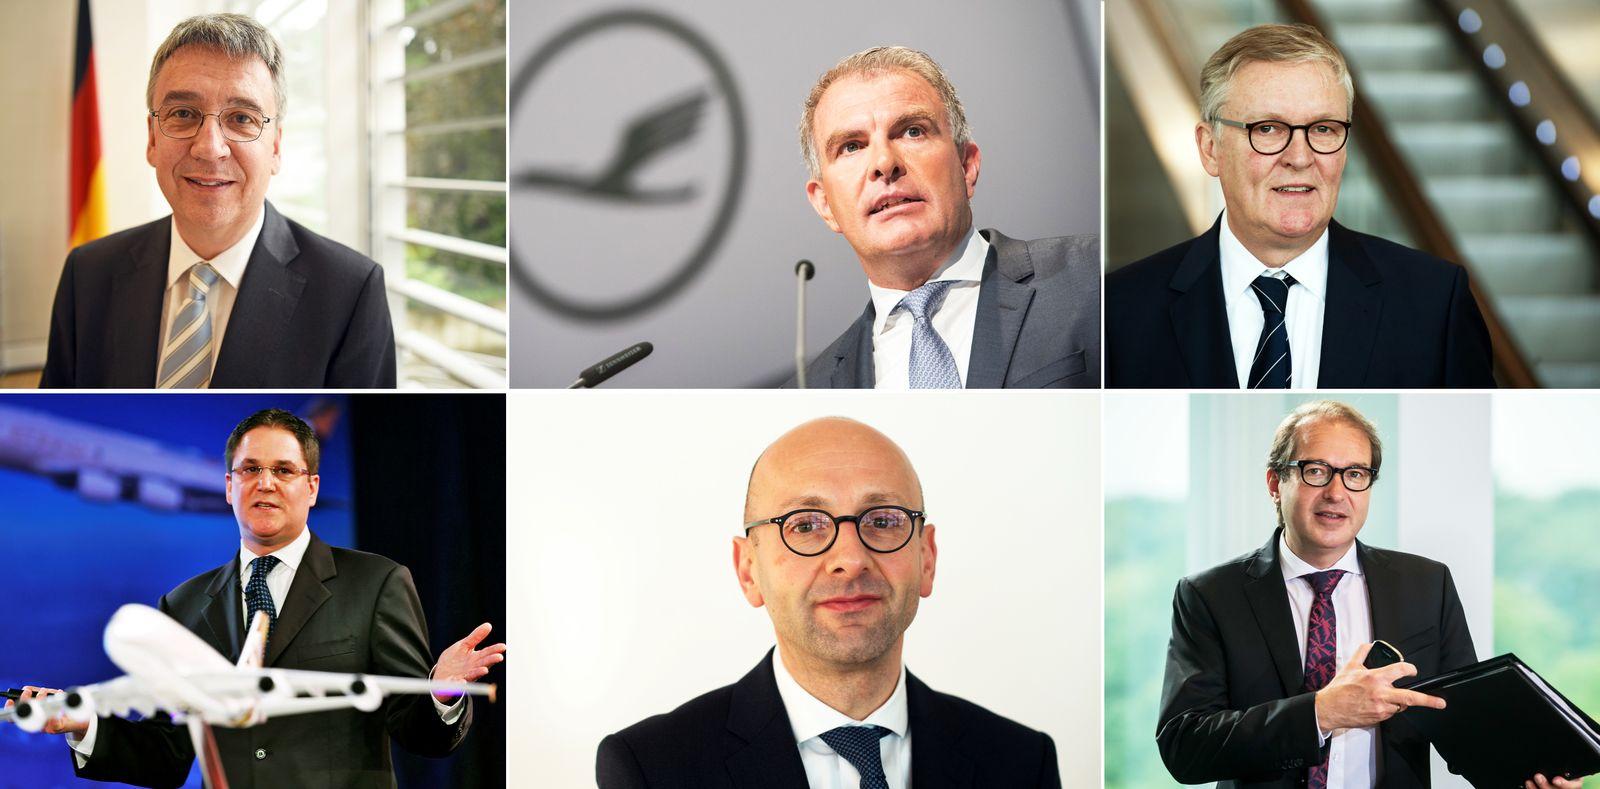 Carsten Spohr, Thomas Winkelmann, Peter Baumgartner, Alexander Dobrindt, Andreas Mundt, Lucas Flther. Kombo